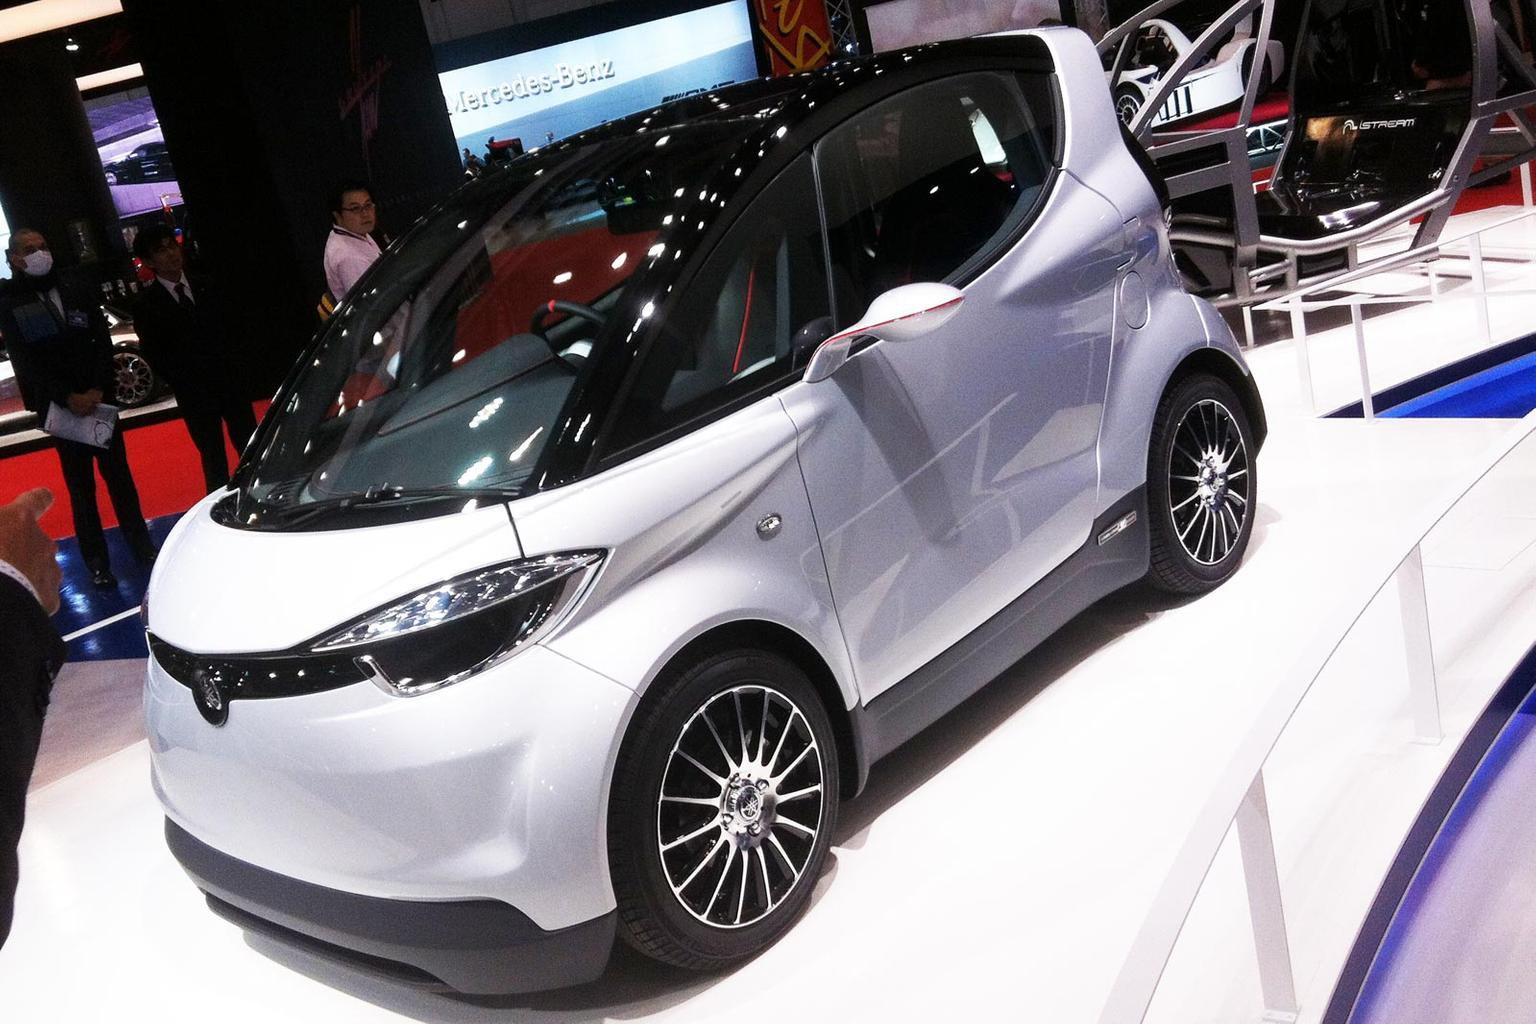 Yamaha unveils Motiv.e city car concept at Tokyo motor show